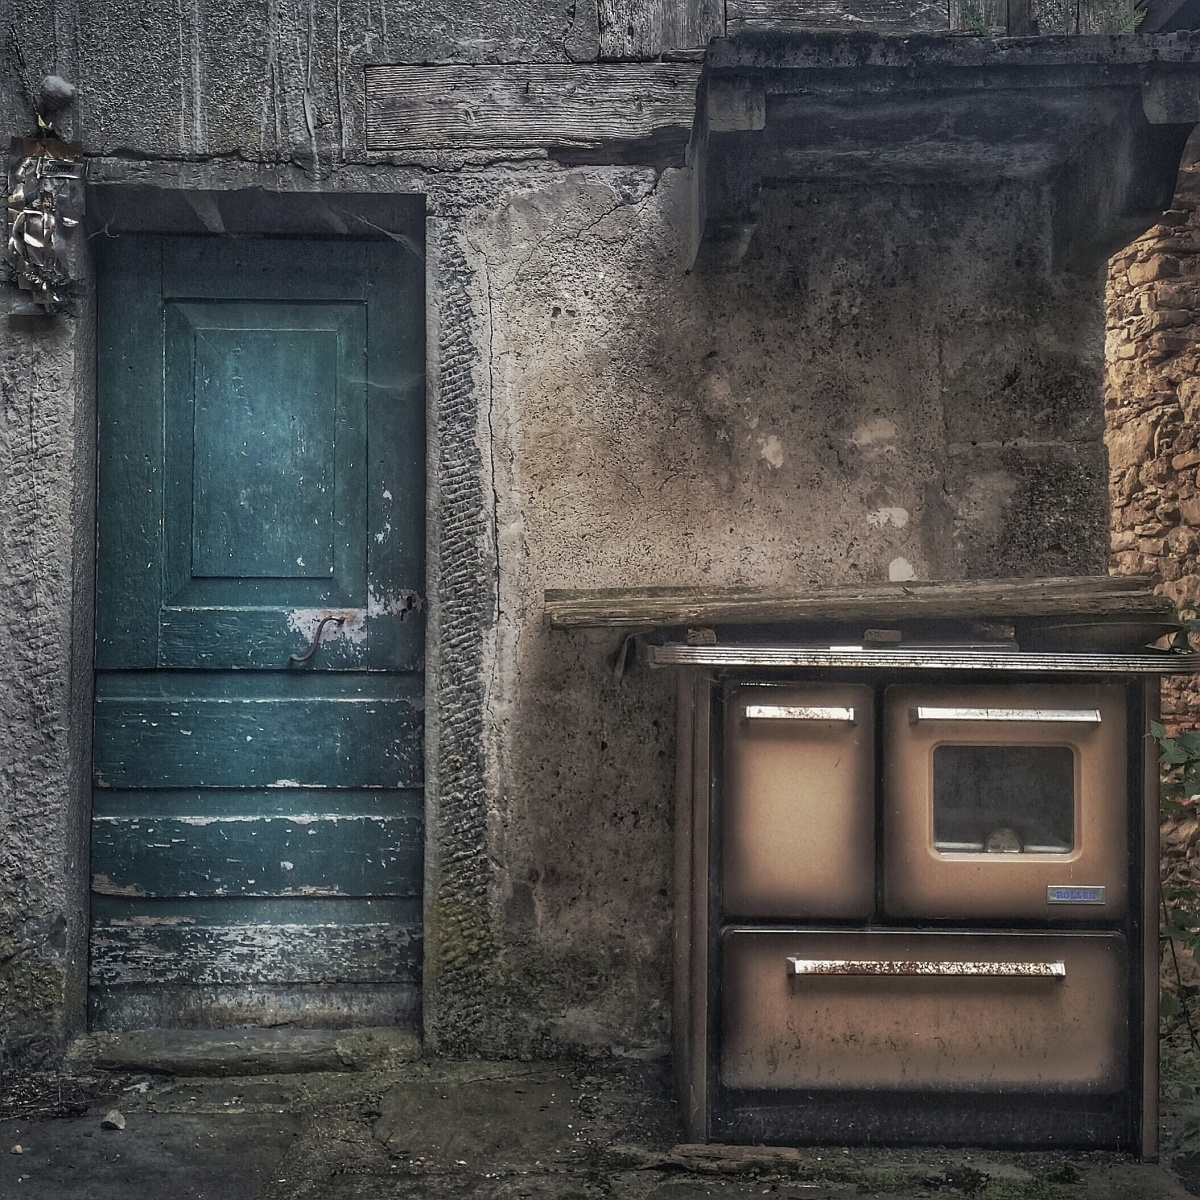 Storie di ordinaria confusione – Pesariis (UD)